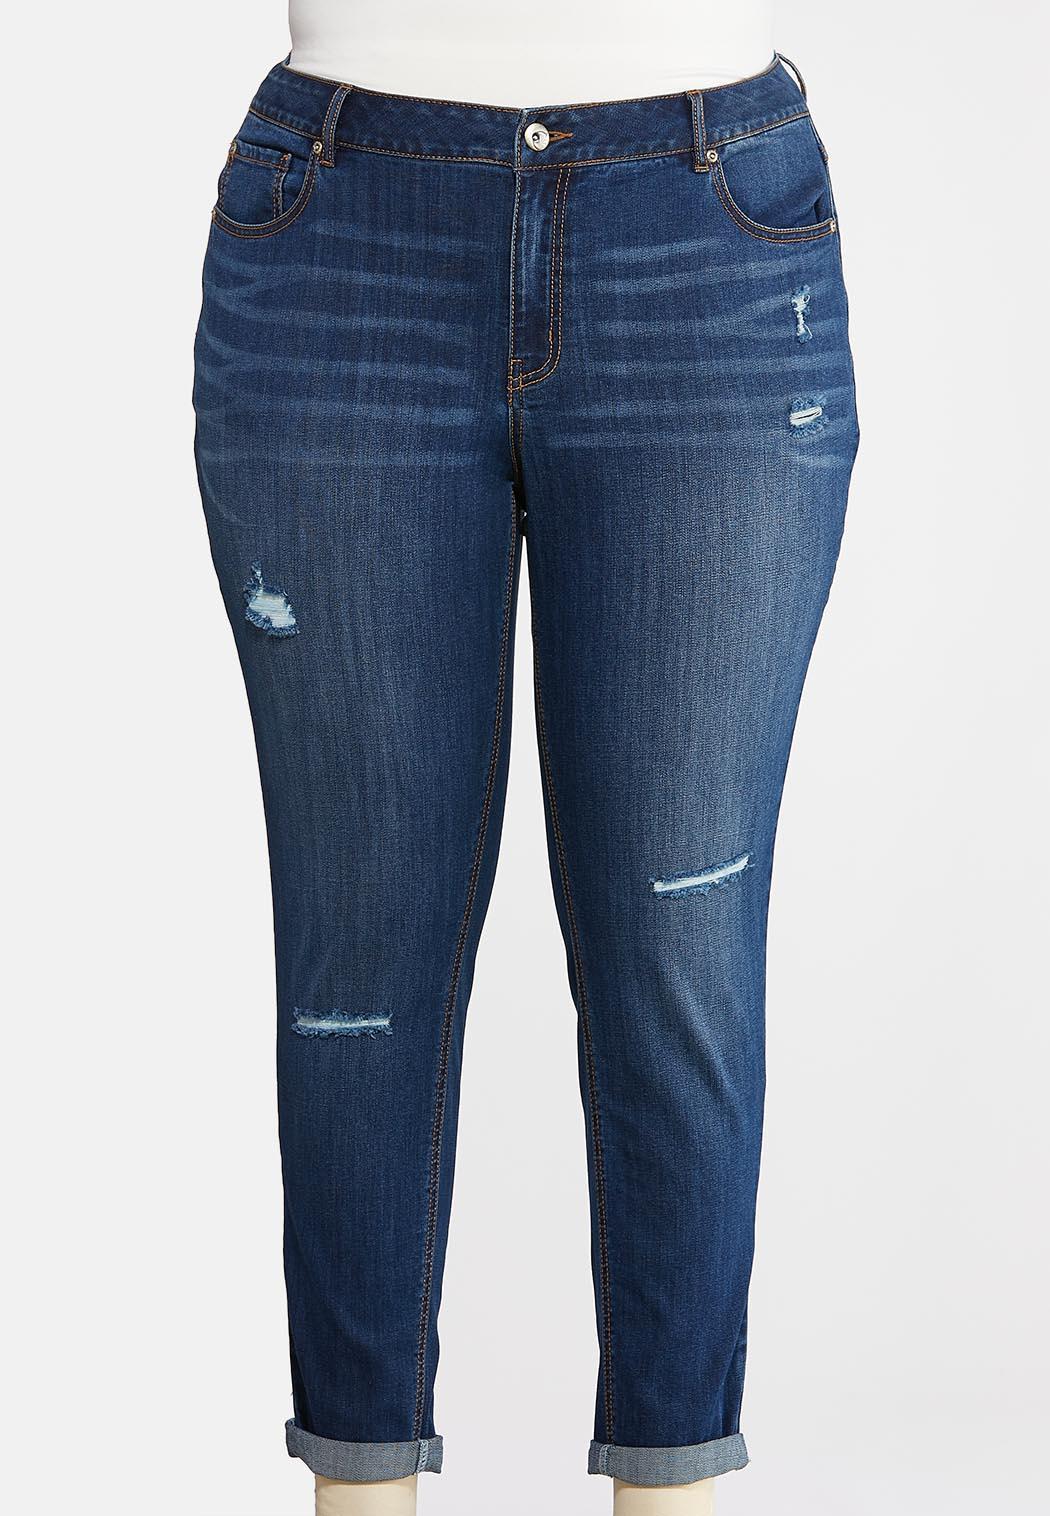 Plus Size Dark Distressed Jeans Denim Cato Fashions